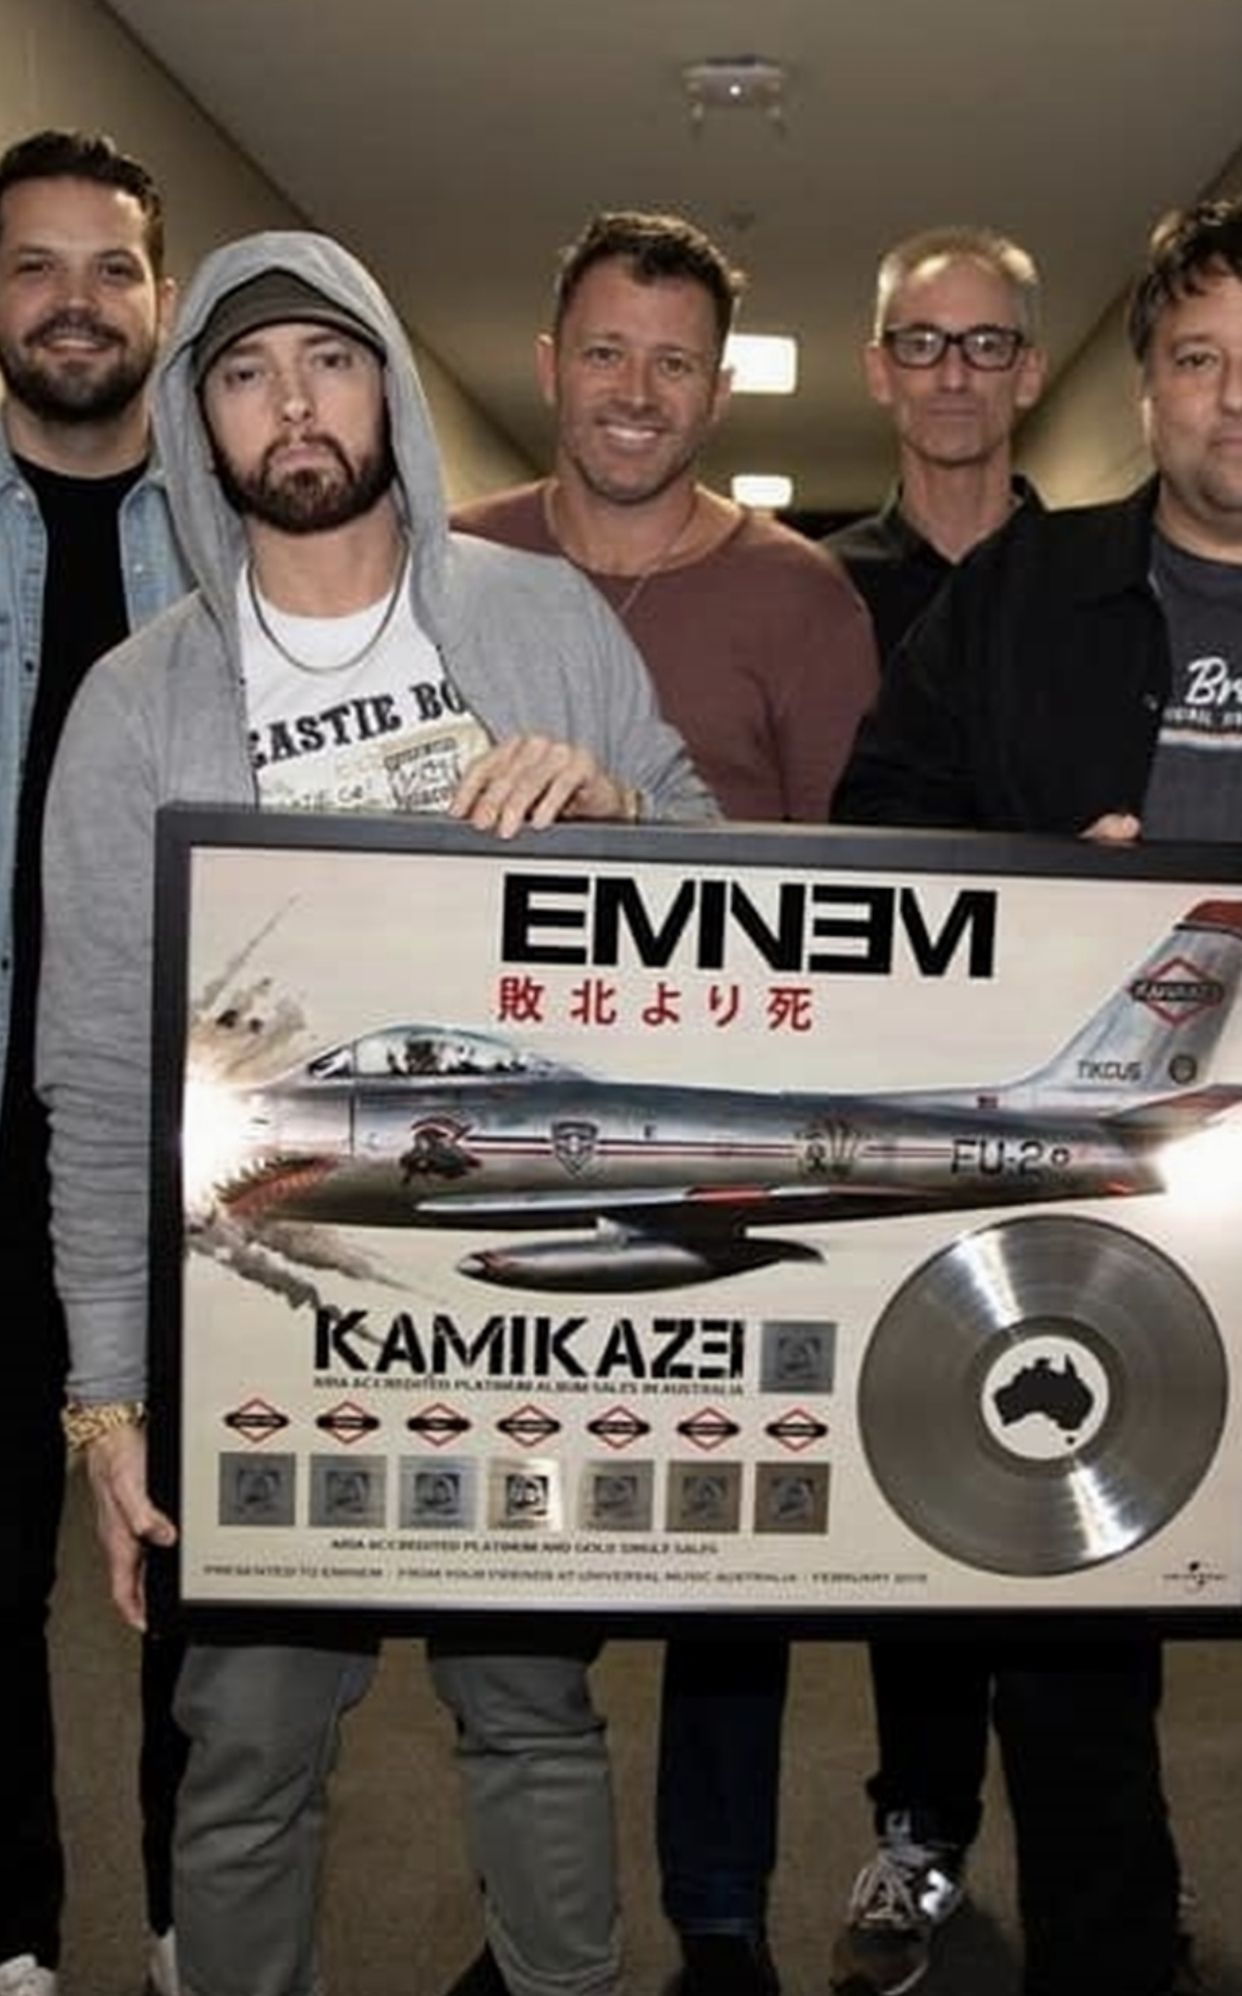 Pin By Omer Zararsiz On Eminem Eminem Rap Eminem Eminem Memes